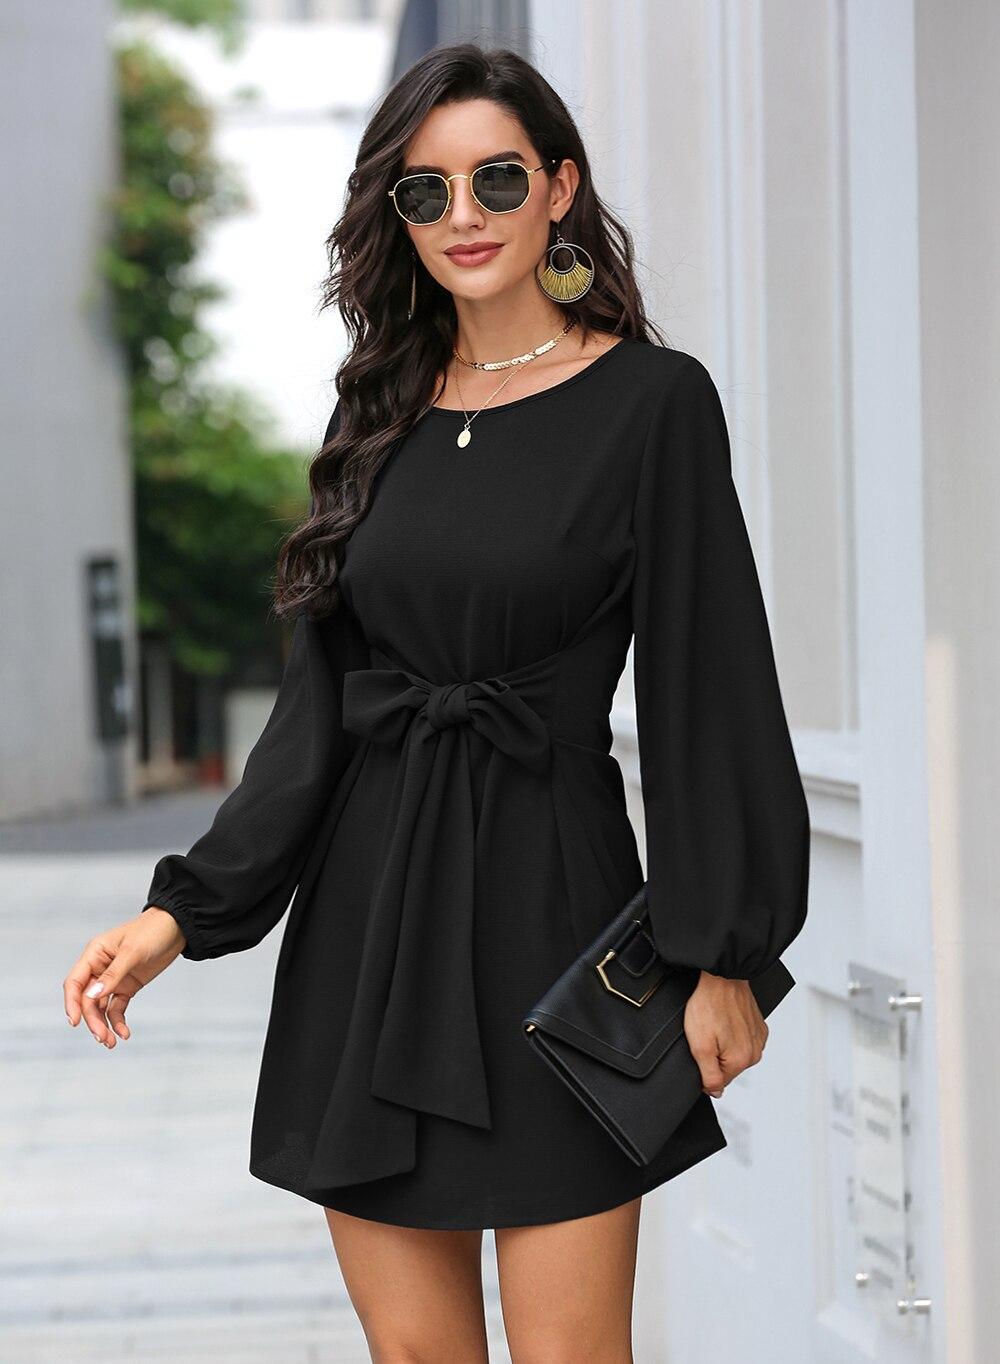 Black Lantern Sleeve Round Neck Casual Dress 21